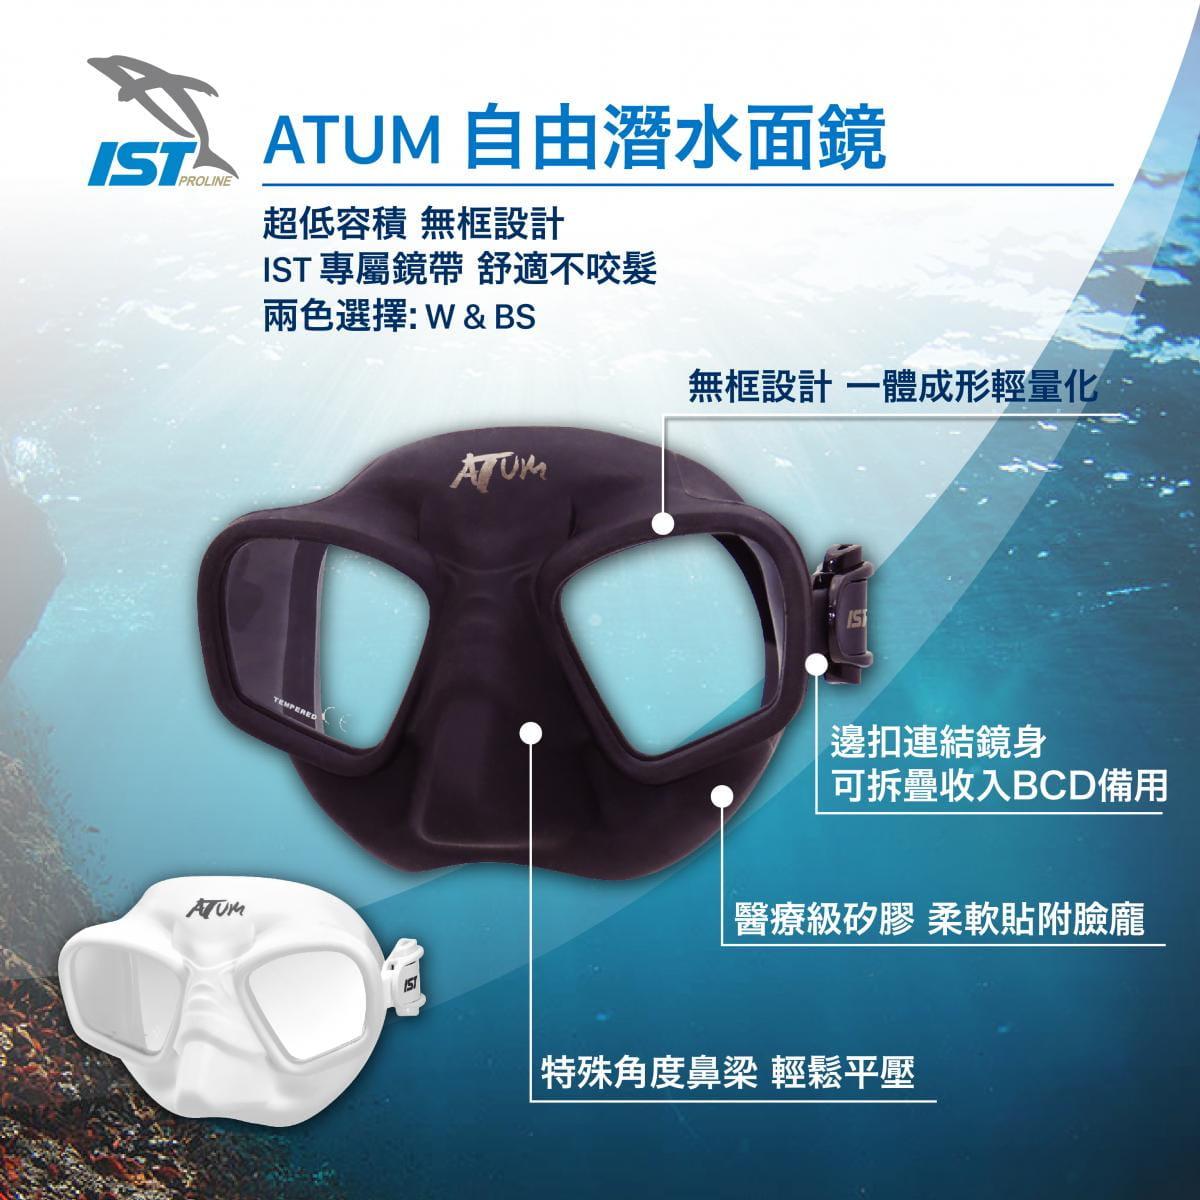 【IST】MIT ATUM 自由潛水面鏡 超低容積 無框設計 MP208 1